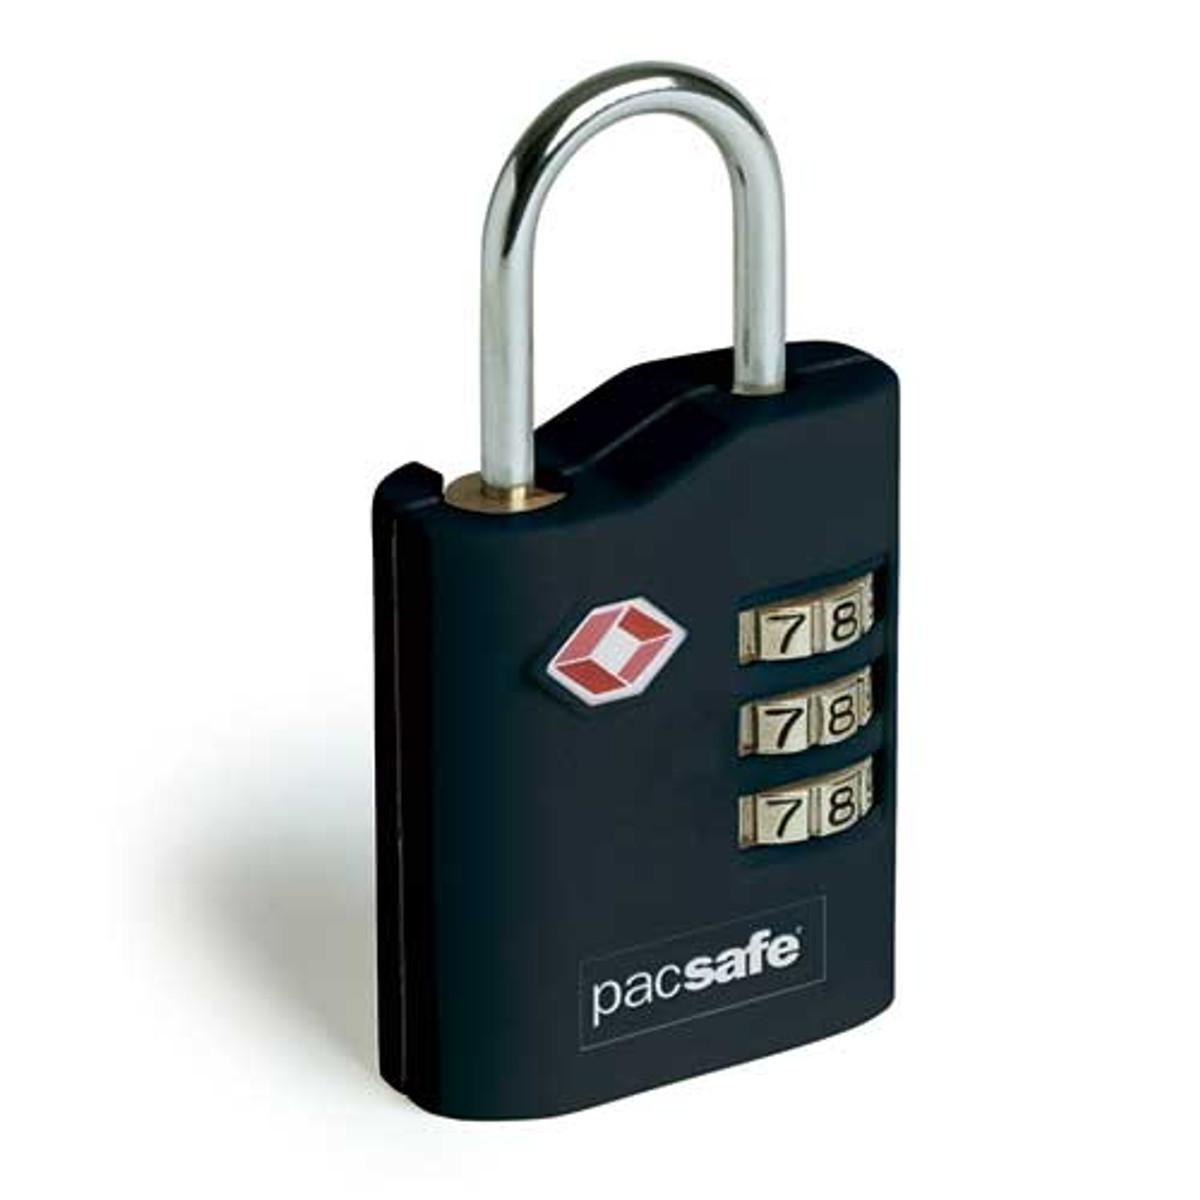 PacSafe ProSafe 700 TSA approved combination lock